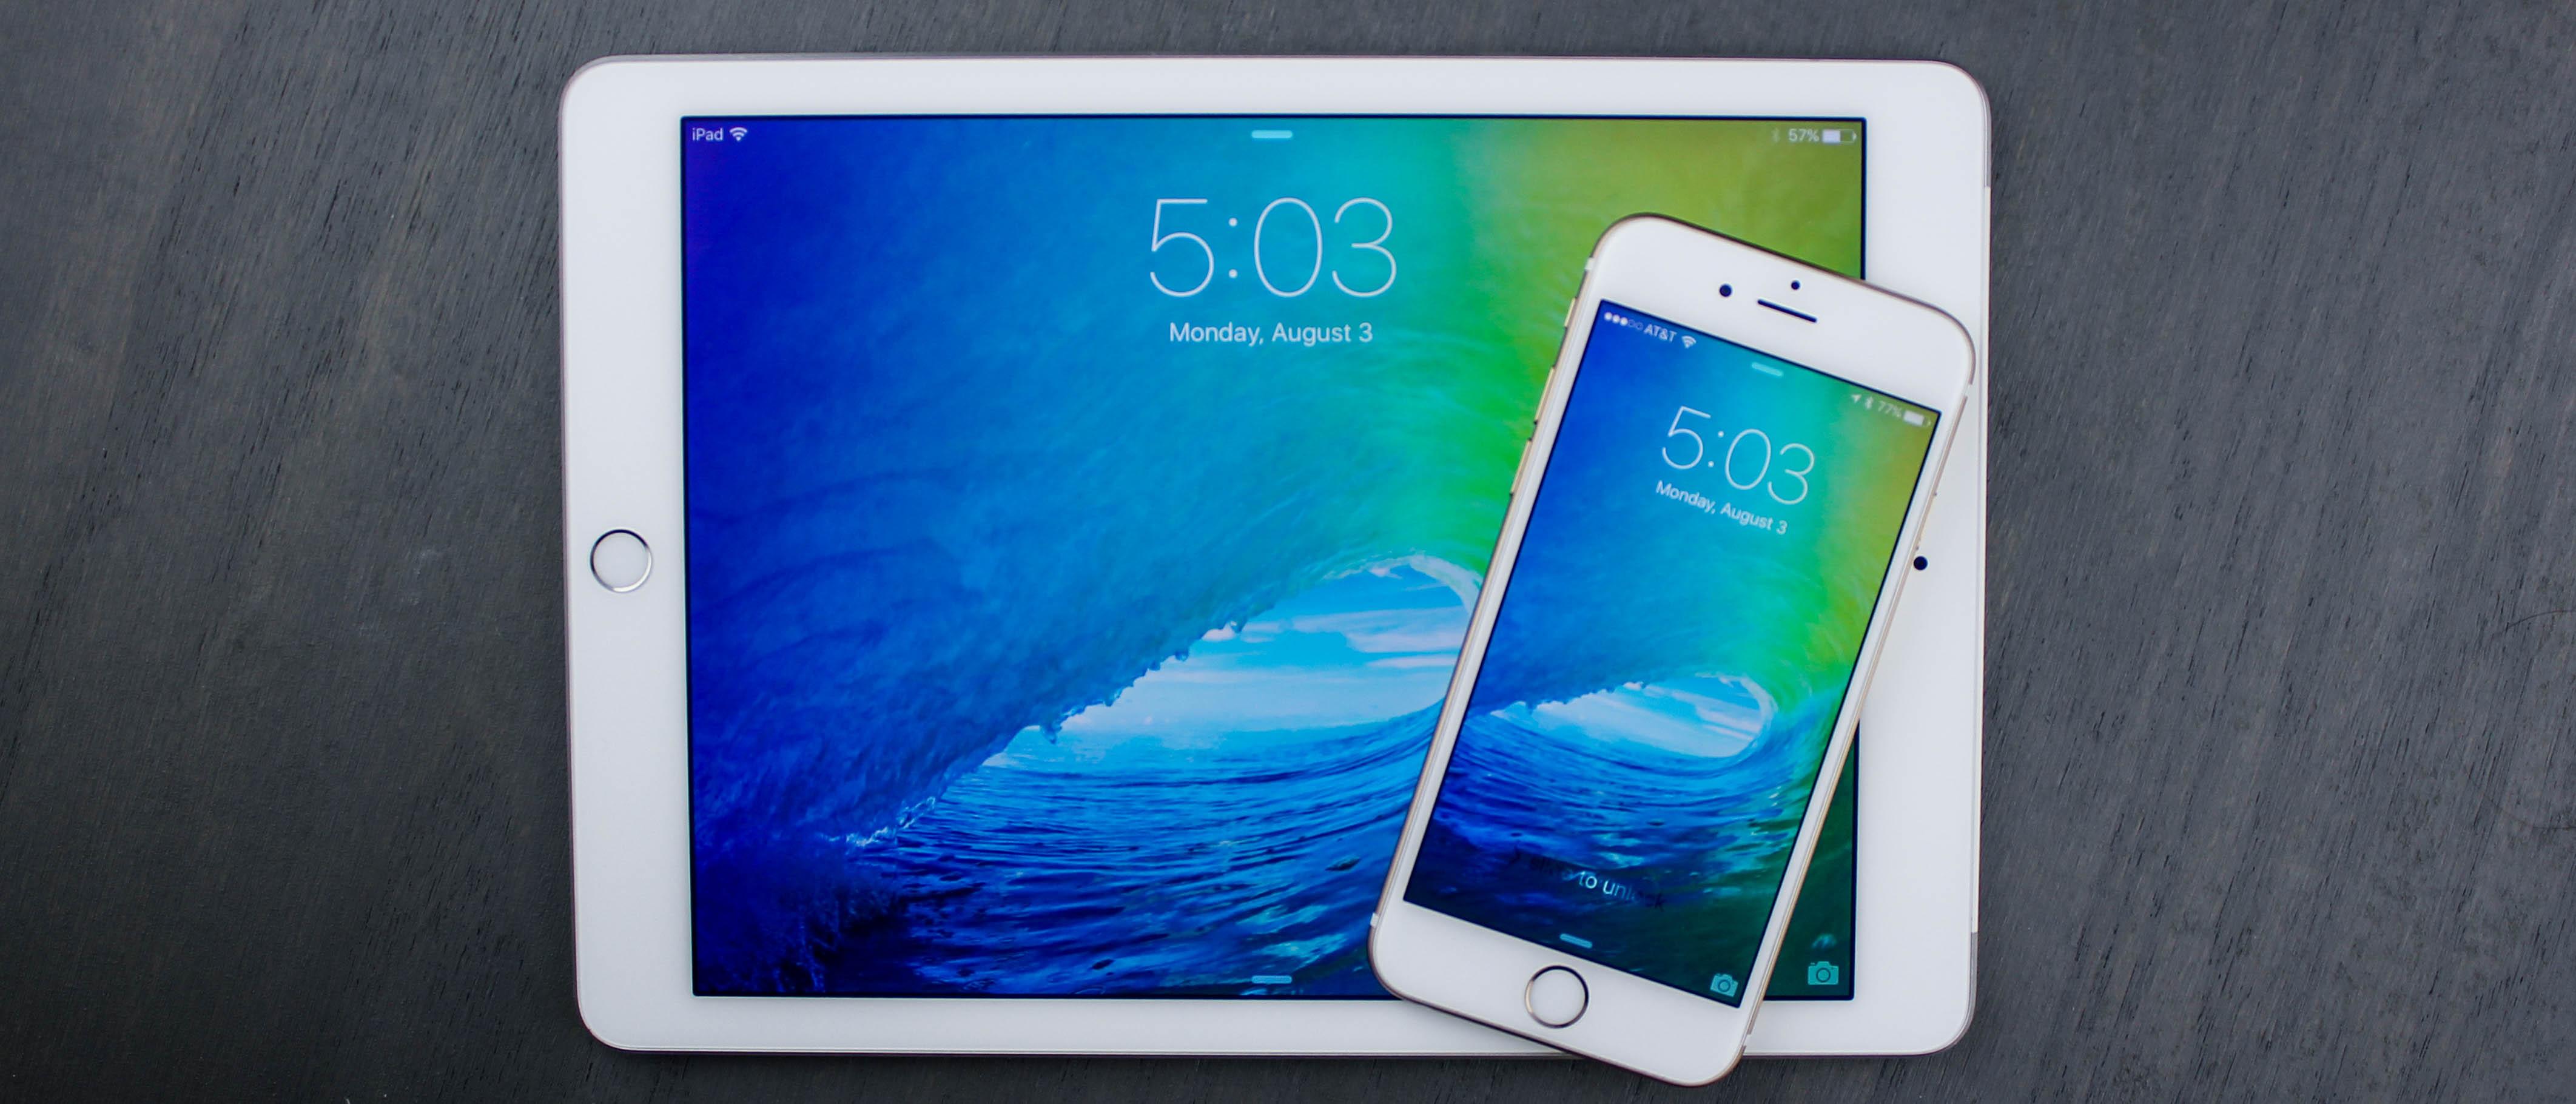 iOS 9 vs iOS 10 comparison: Delete preinstalled apps